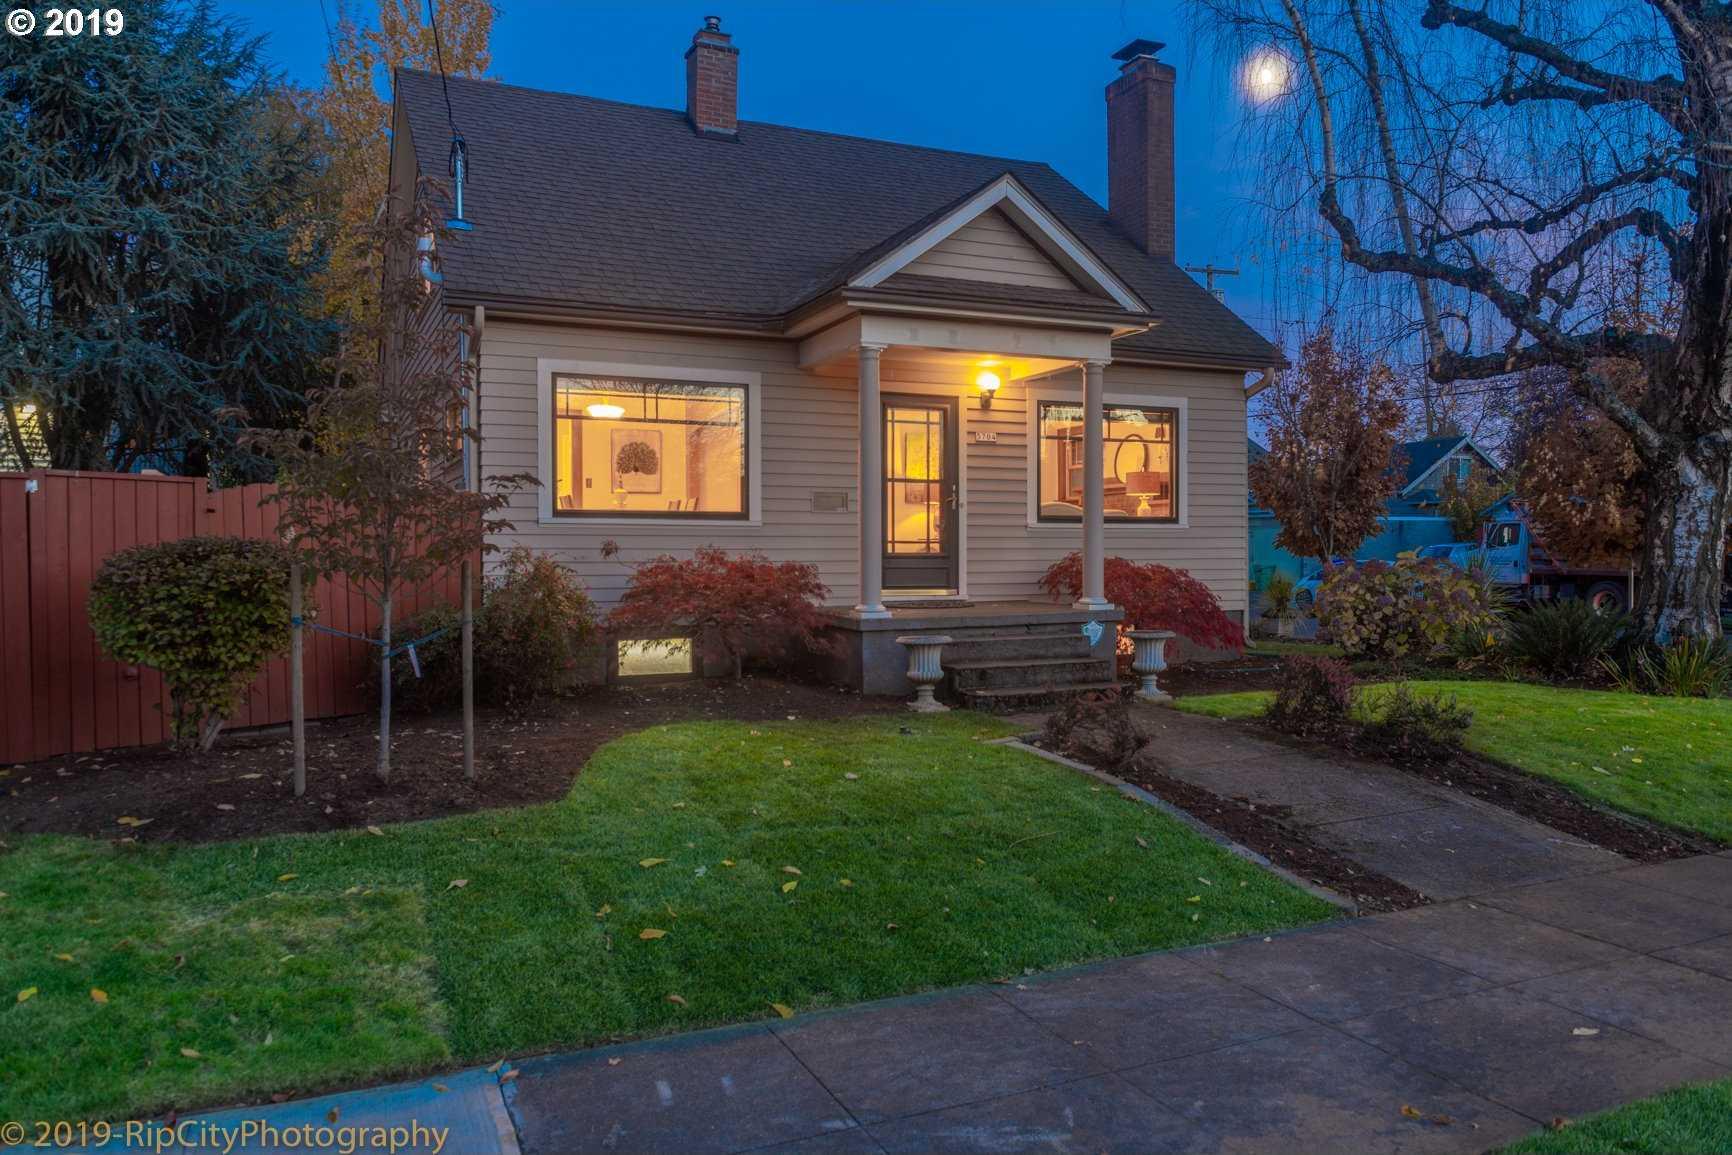 $469,900 - 2Br/1Ba - for Sale in Overlook, Portland